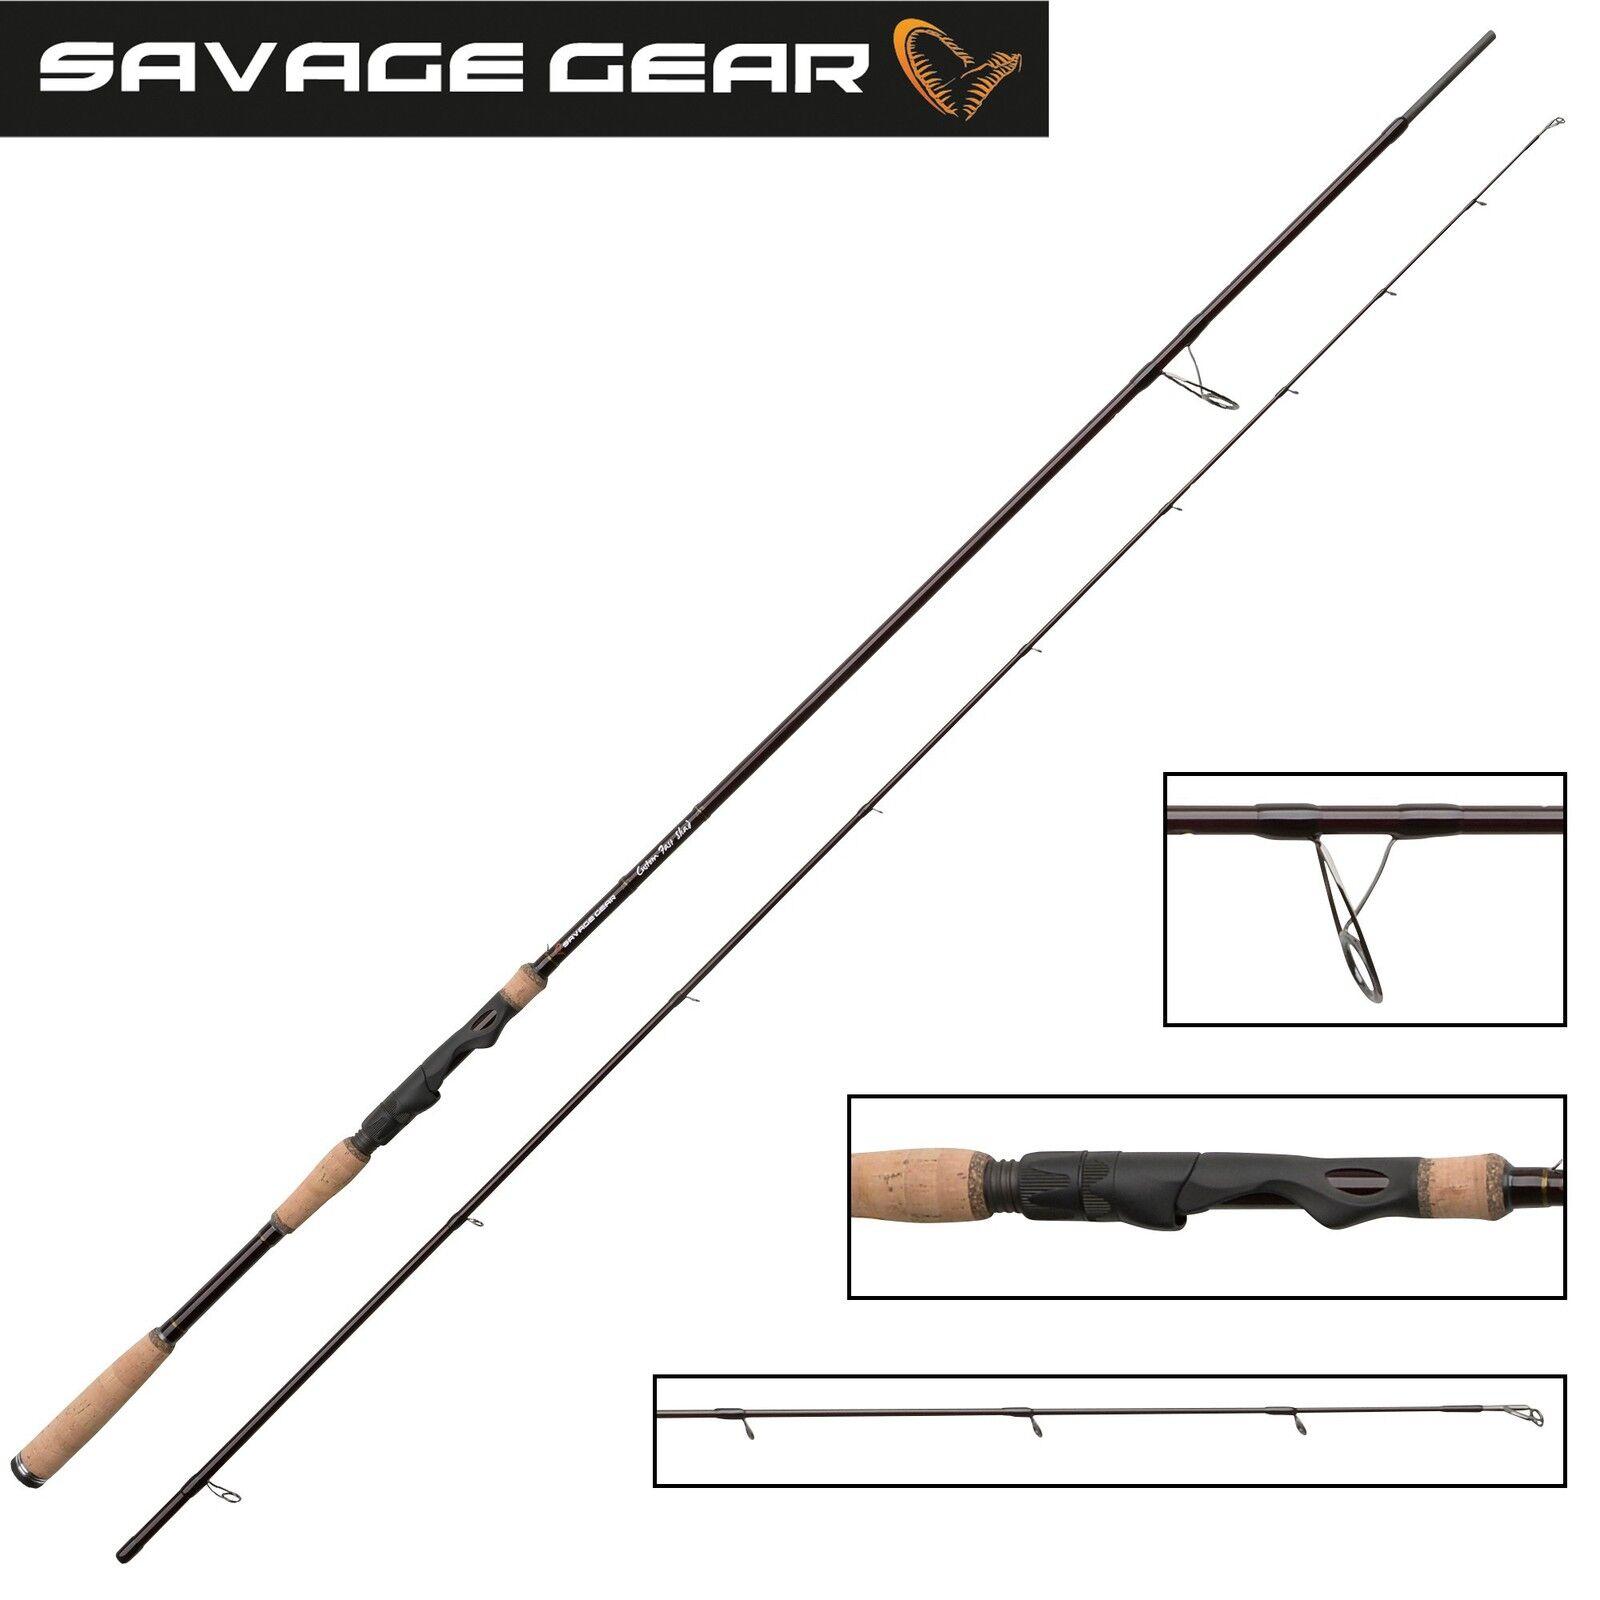 Savage Gear Custom PROTator Fast Shad 258cm 258cm 258cm 65g Spinnrute, Spinnangel, Hechtrute f1a156